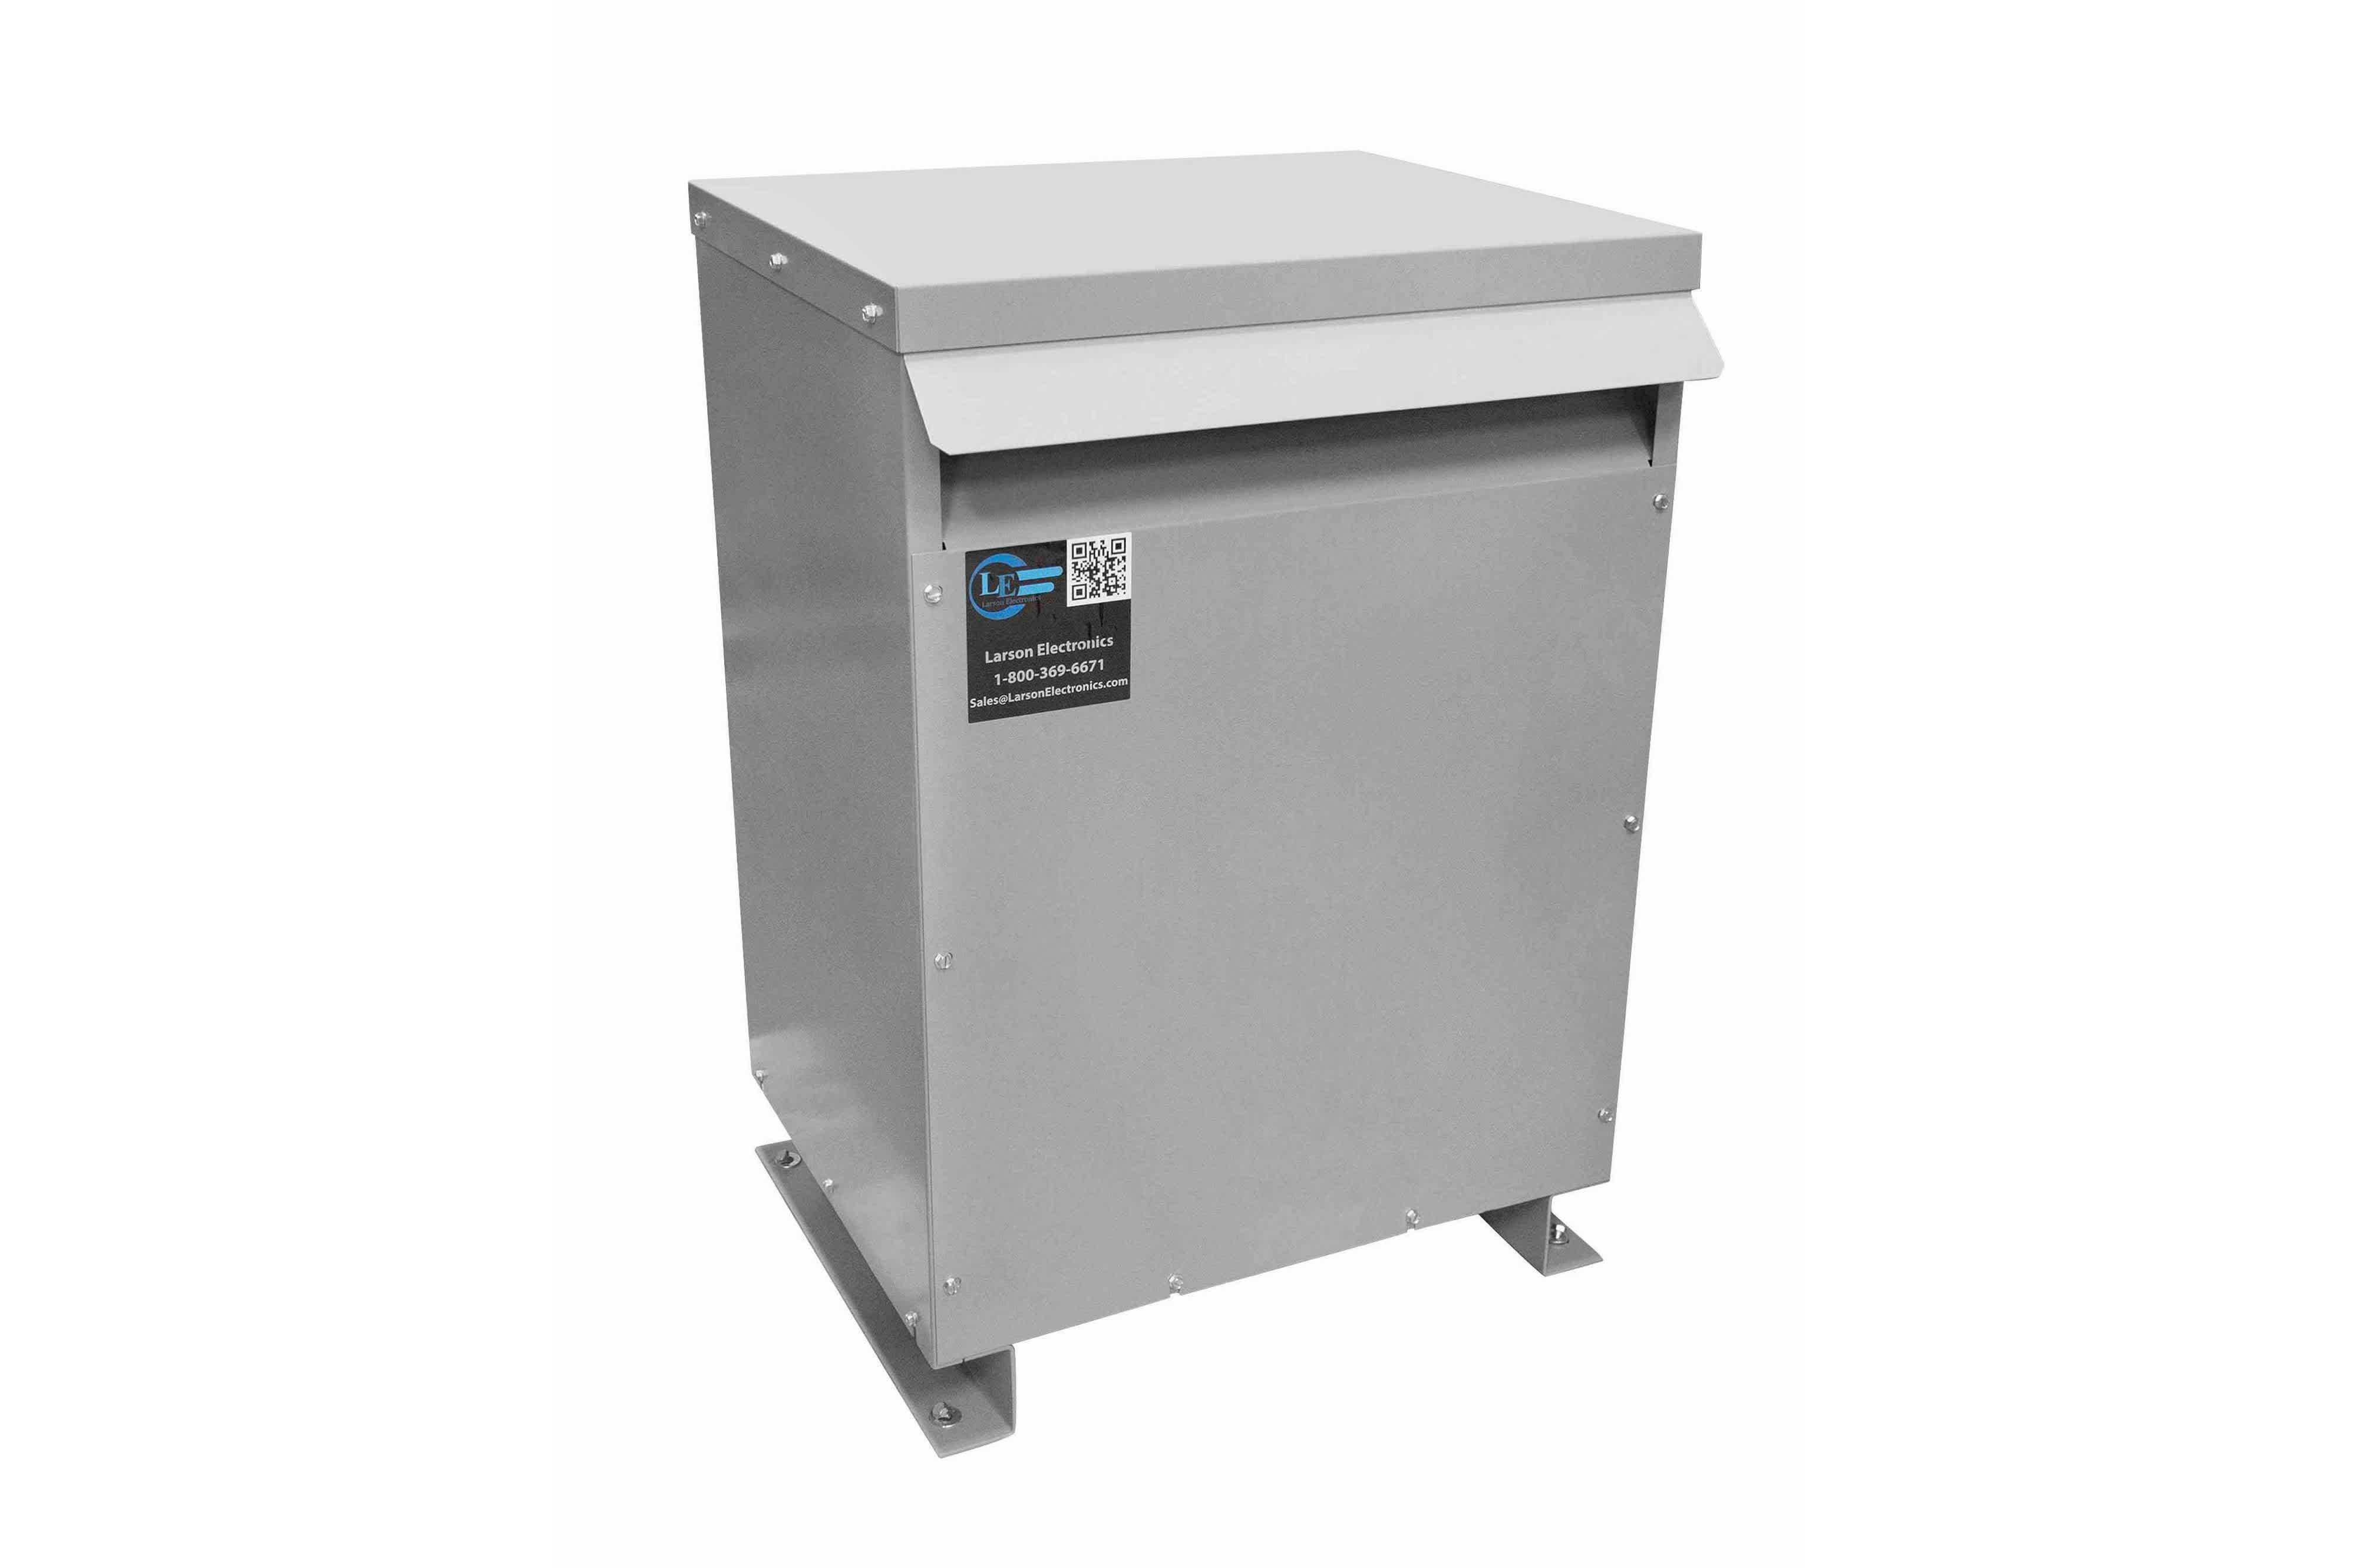 37.5 kVA 3PH Isolation Transformer, 480V Wye Primary, 380V Delta Secondary, N3R, Ventilated, 60 Hz